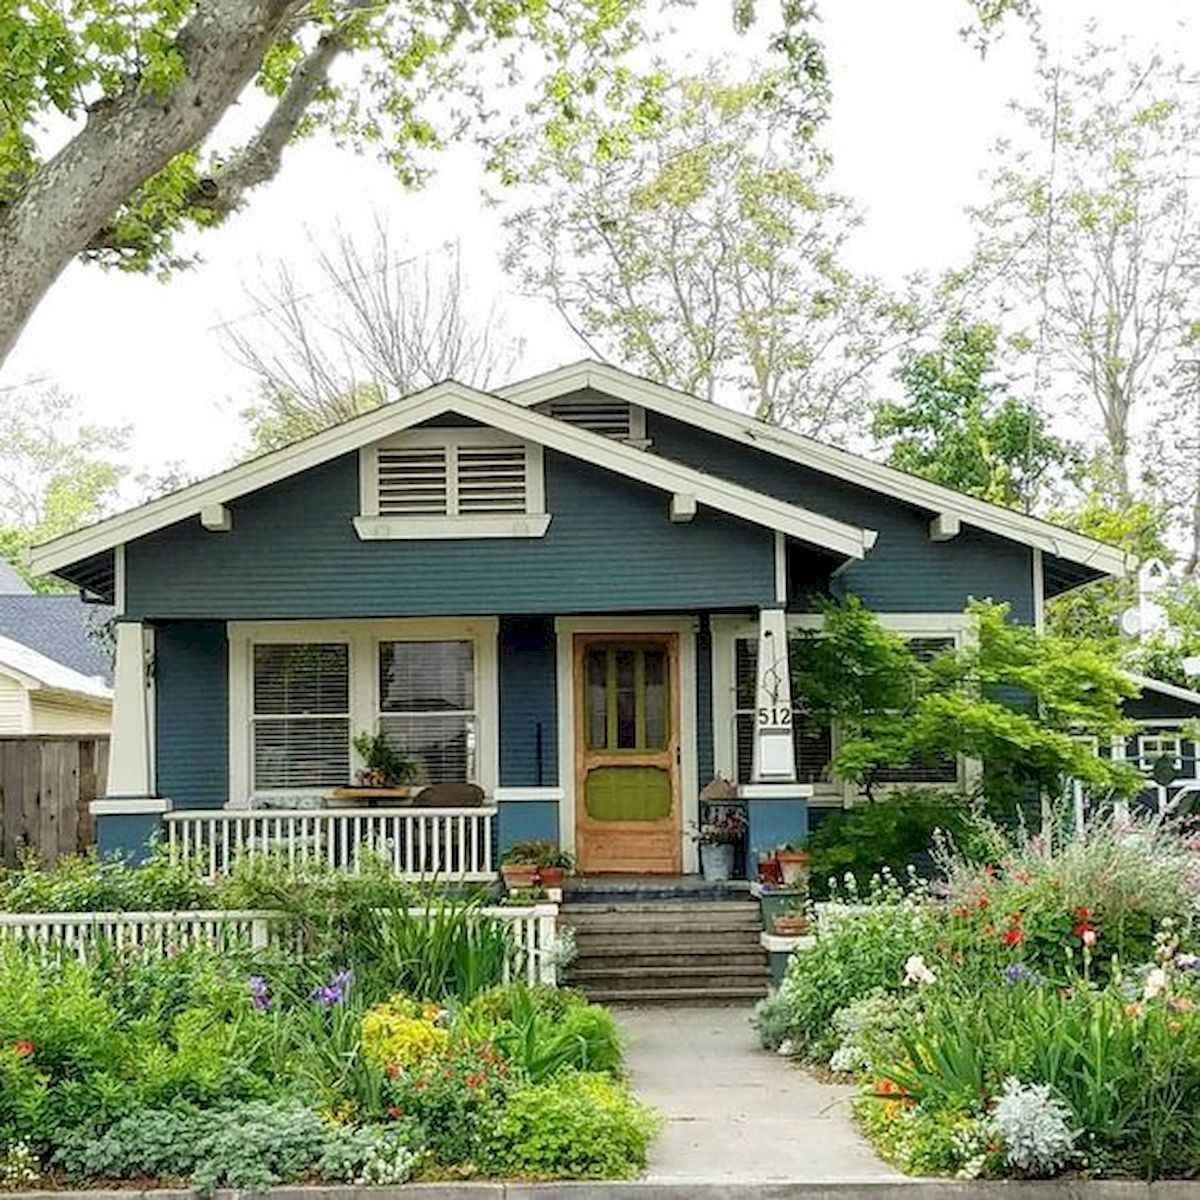 40 Amazing Craftsman Style Homes Design Ideas 31 Craftsman Bungalow Exterior Bungalow Exterior Craftsman Bungalows